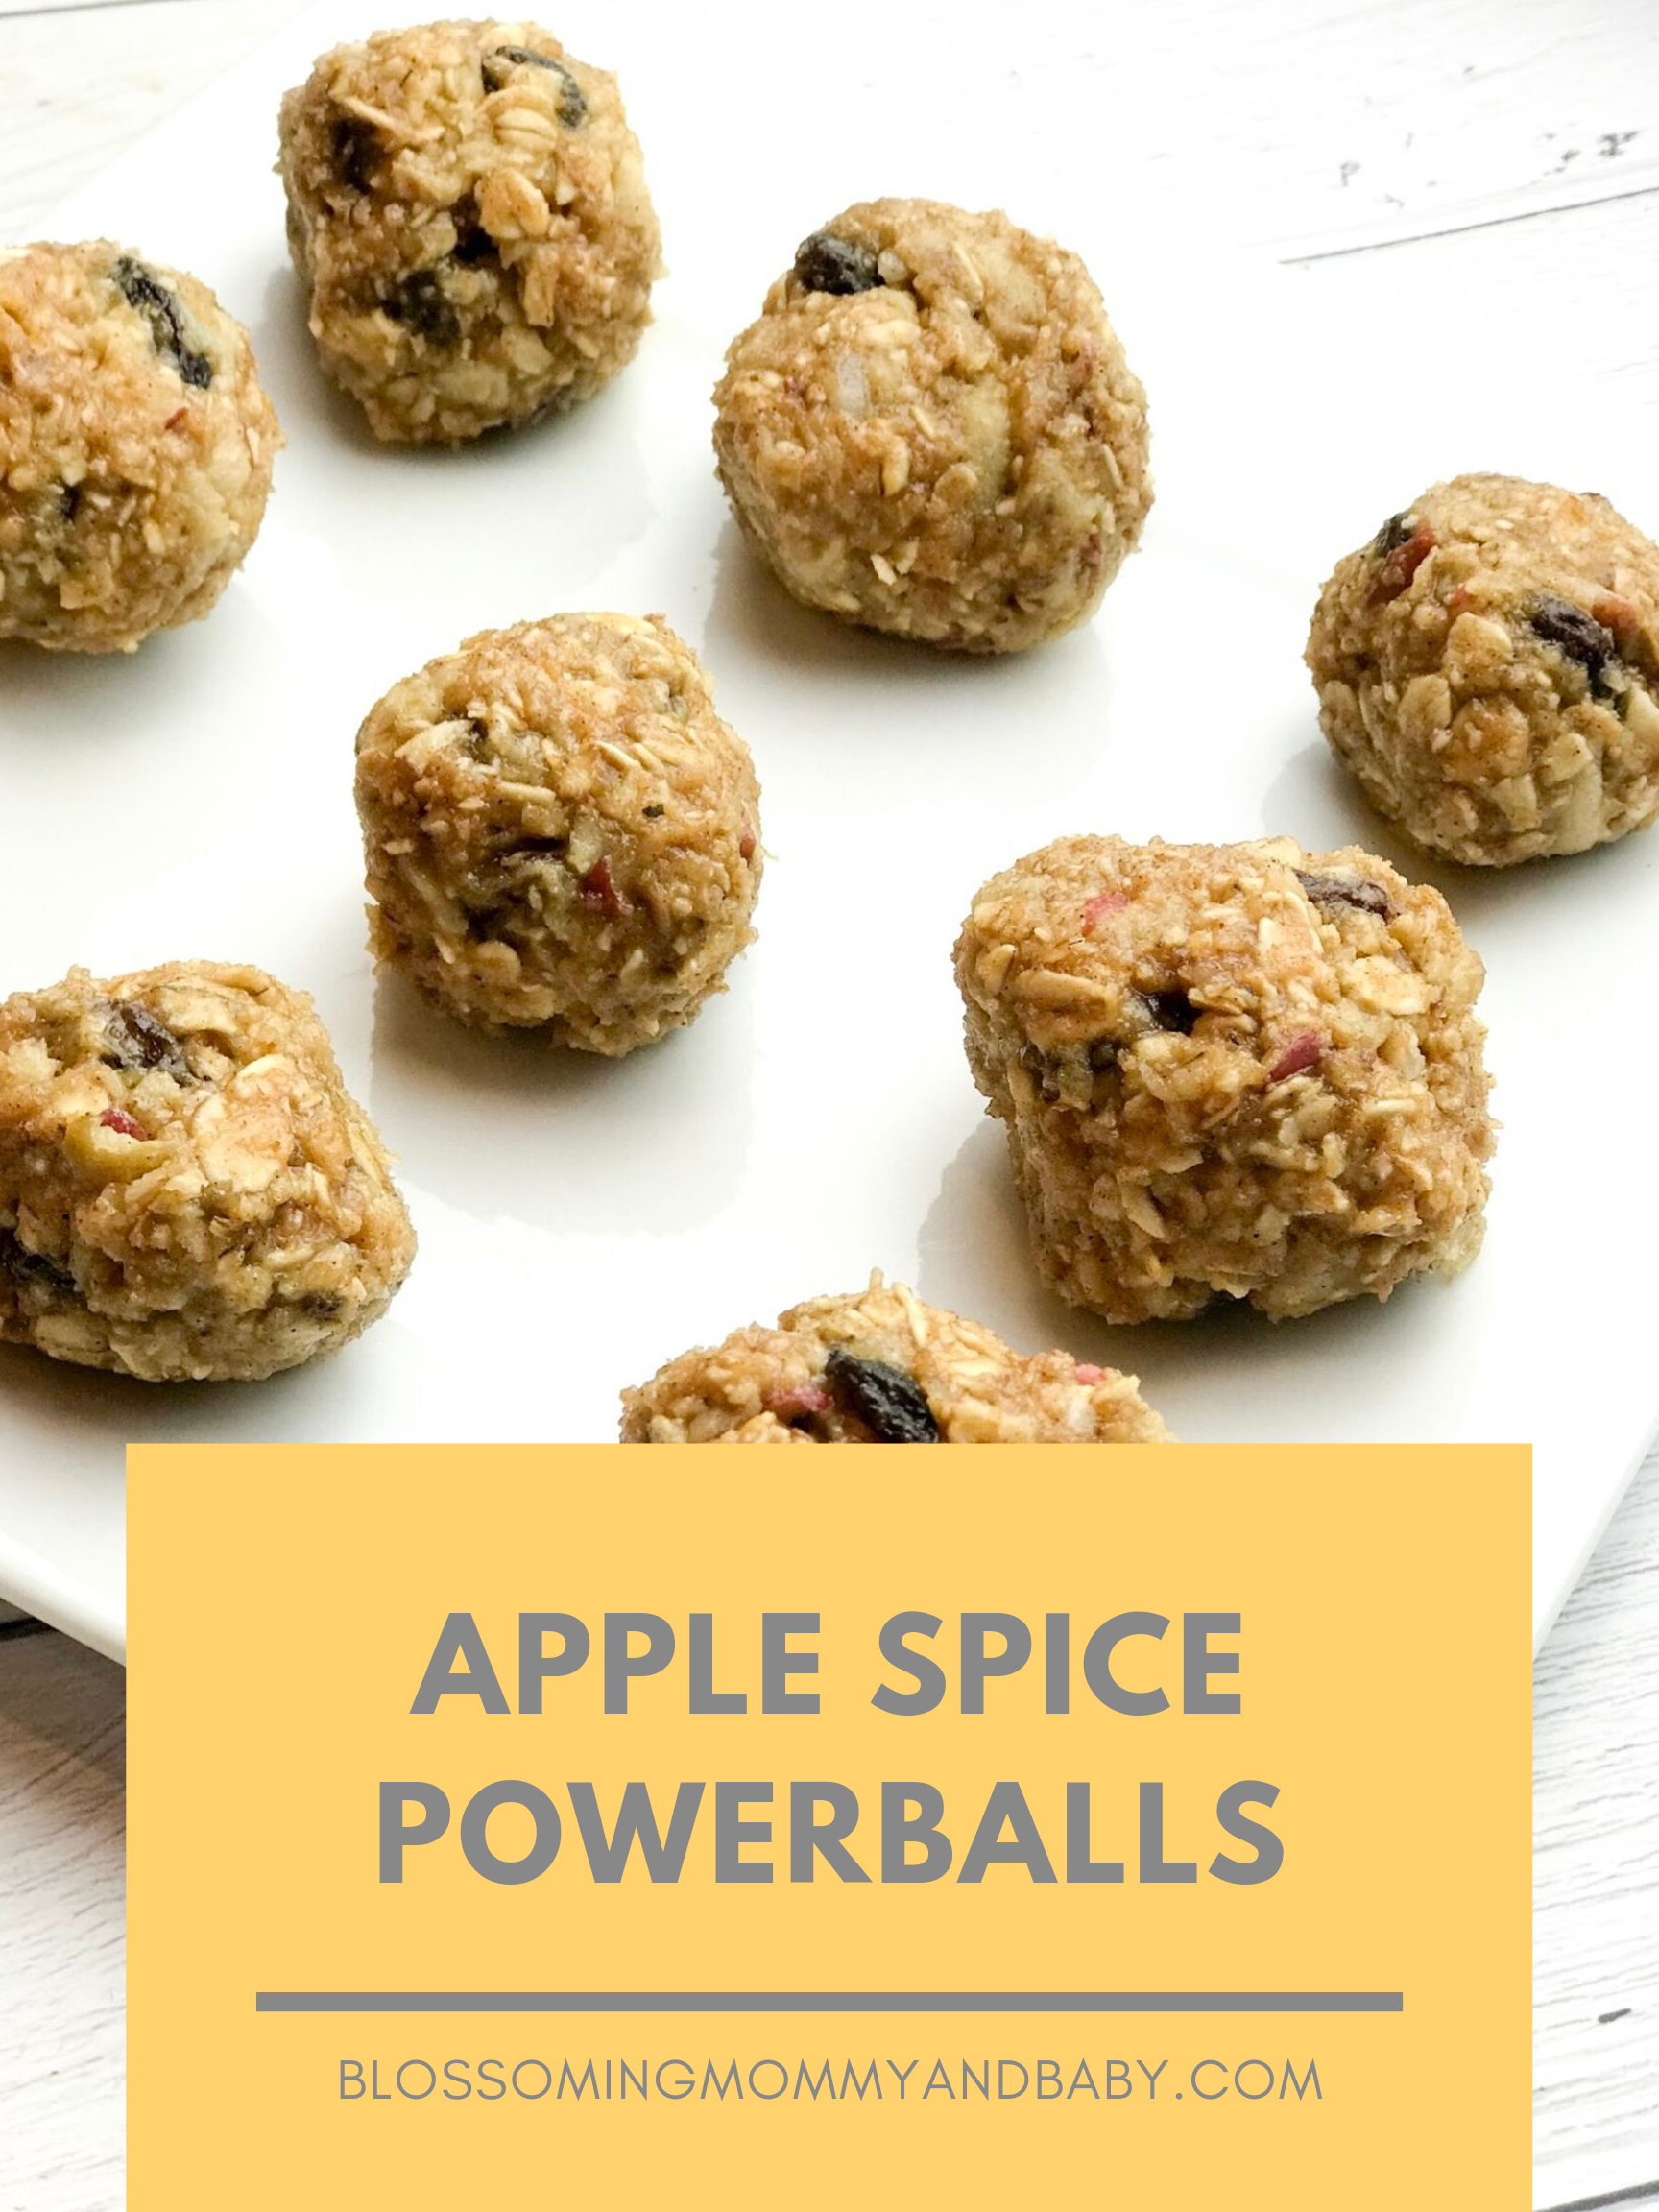 Apple Spice Powerballs